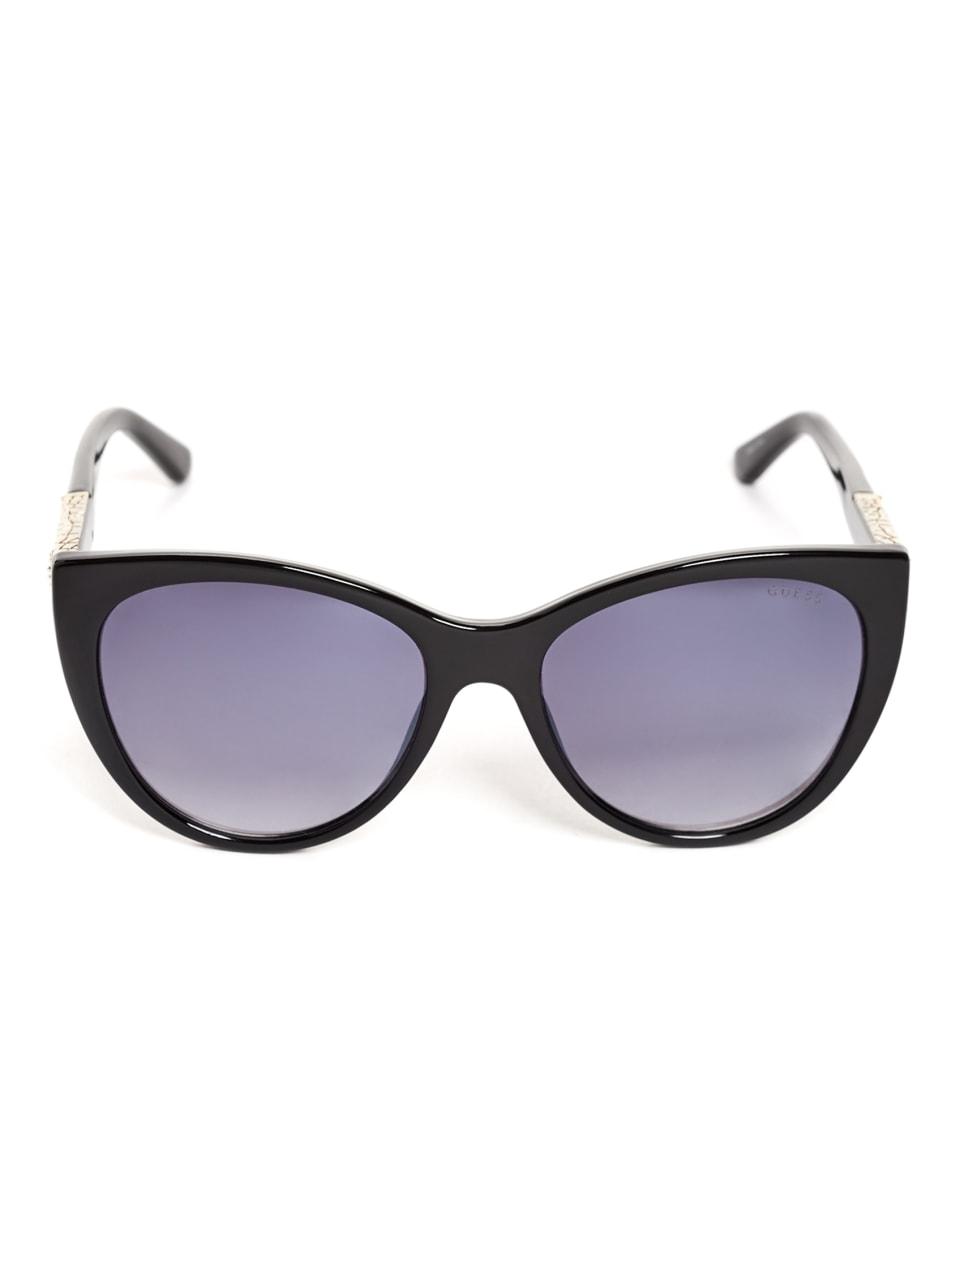 GUESS-Factory-Women-039-s-Plastic-Cat-Eye-Sunglasses thumbnail 6